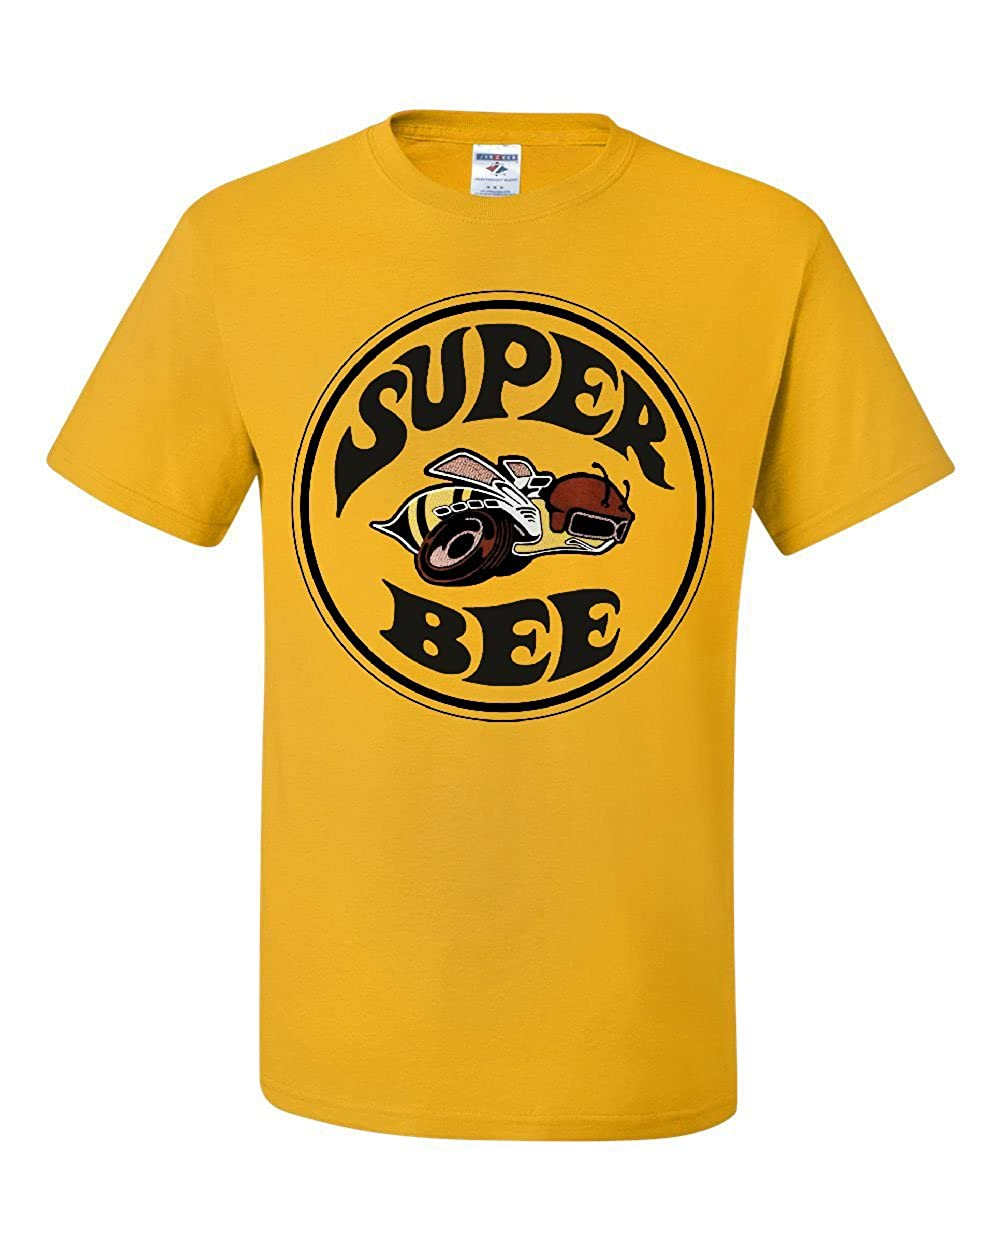 010cd713 Amazon.com: Dodge Super Bee T-Shirt American Muscle Car Tee Shirt: Clothing